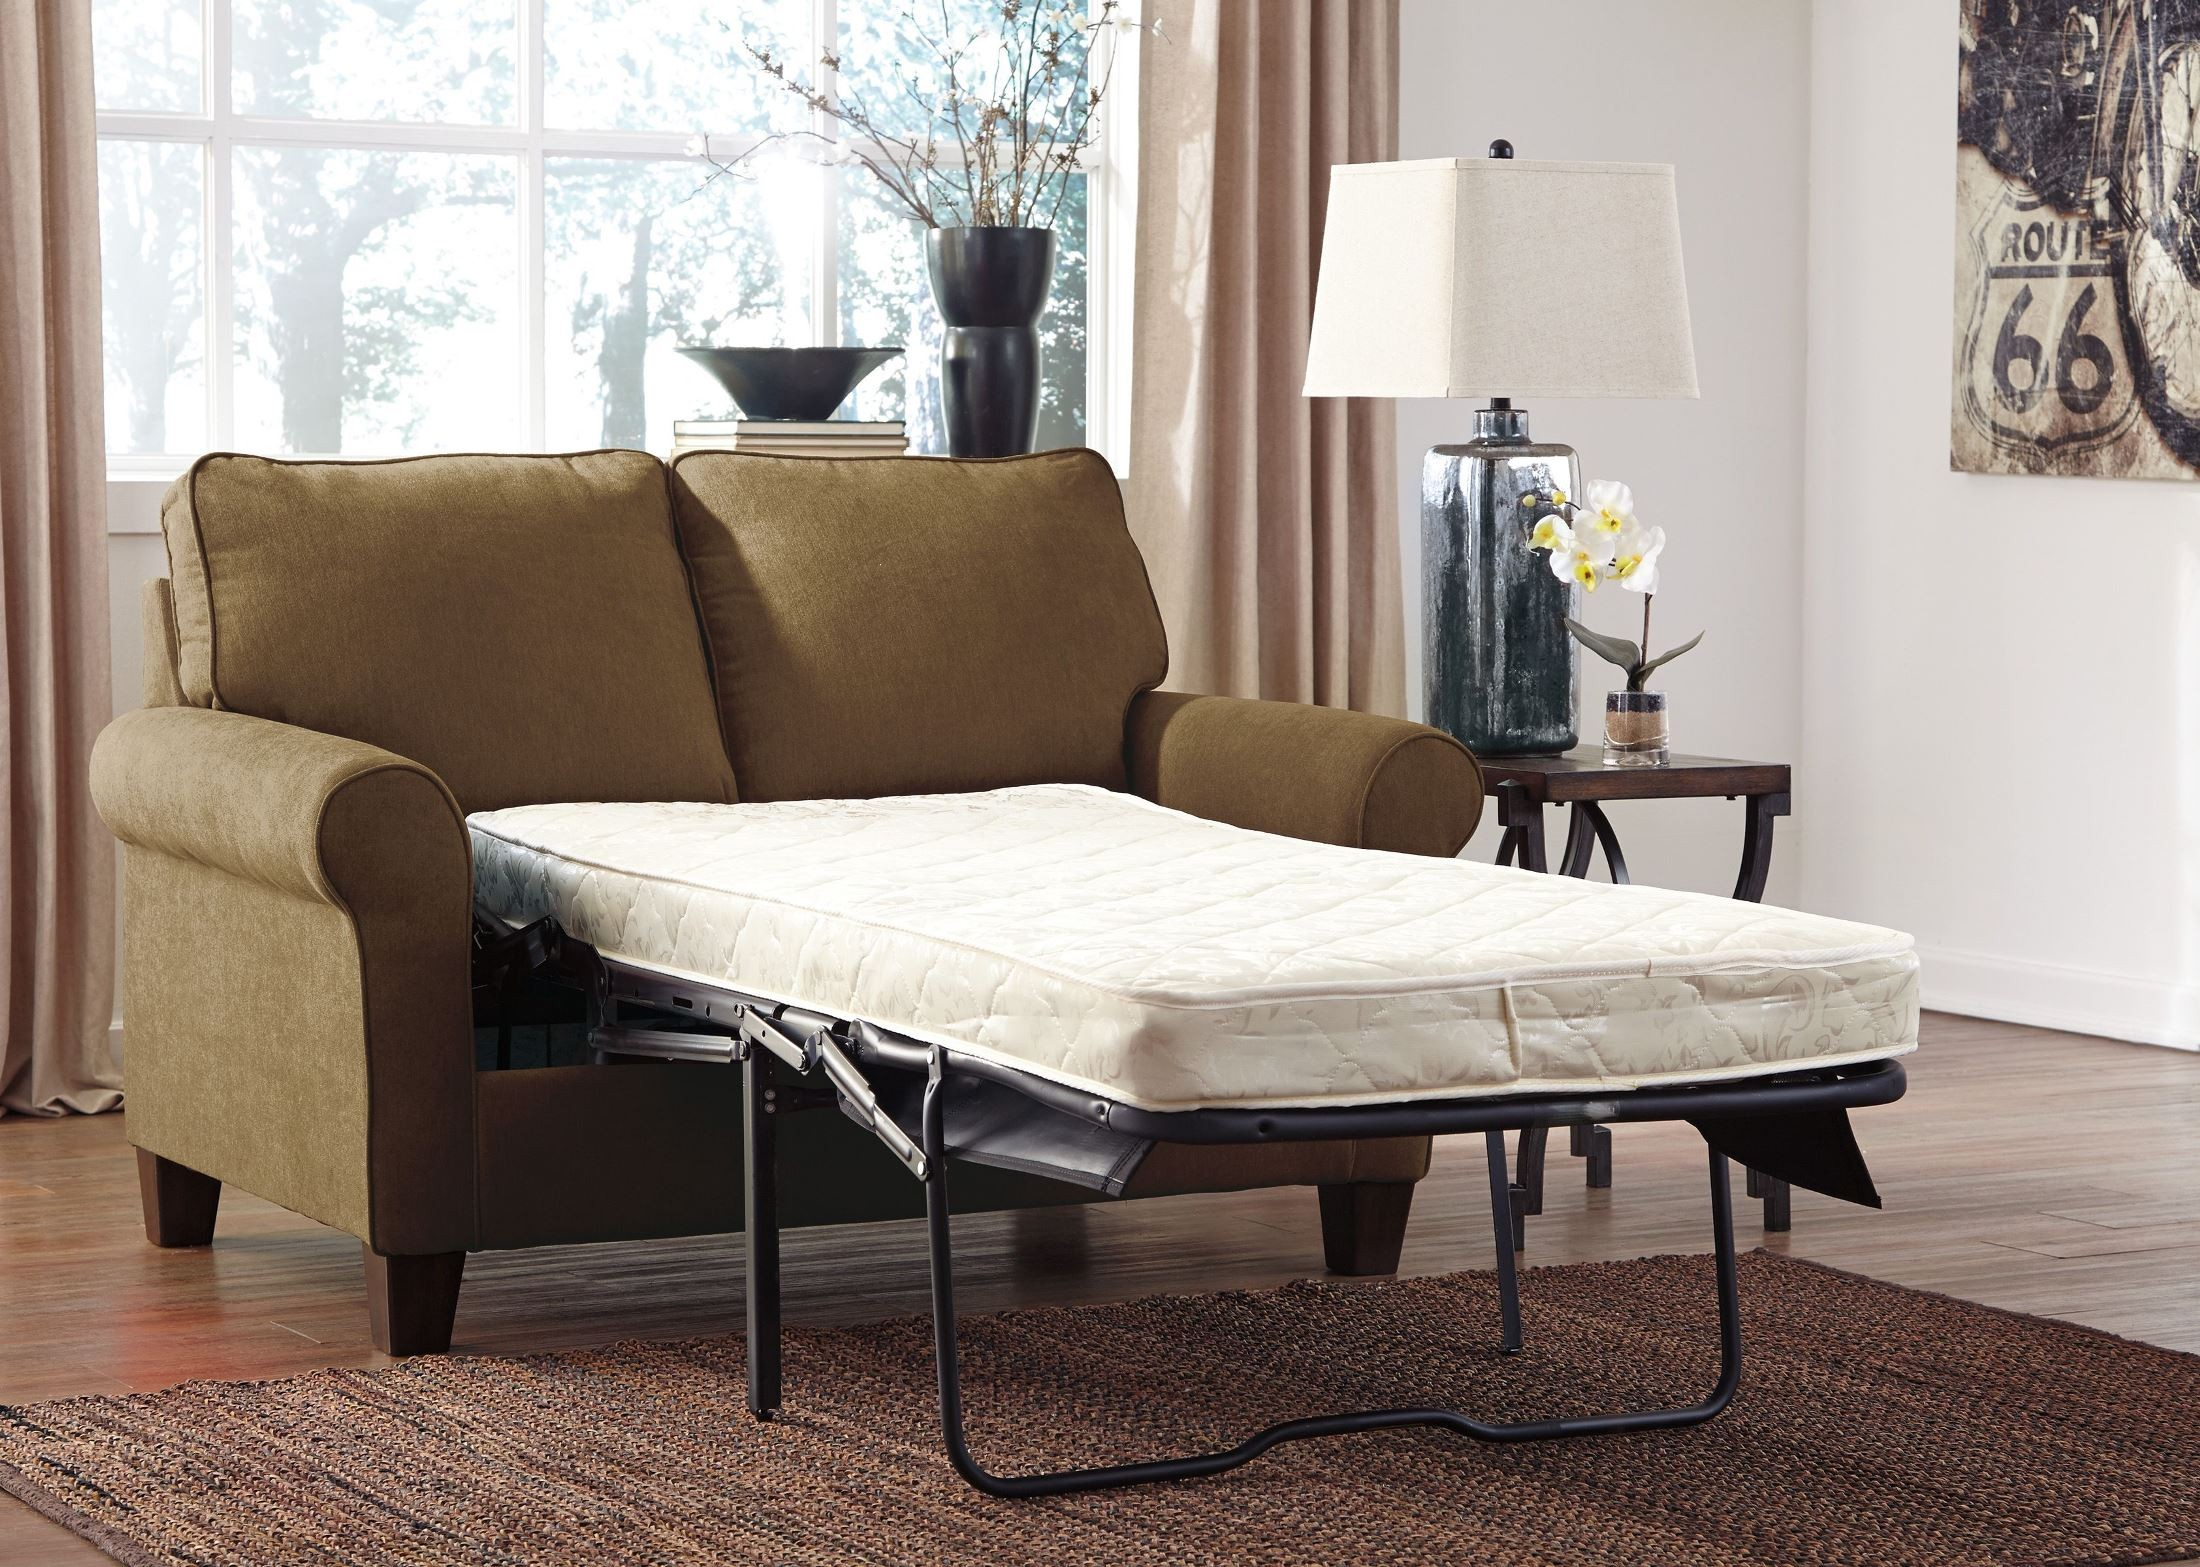 Zeth Basil Twin Sofa Sleeper from Ashley 2710337  : 27103 37 open from colemanfurniture.com size 2200 x 1567 jpeg 772kB